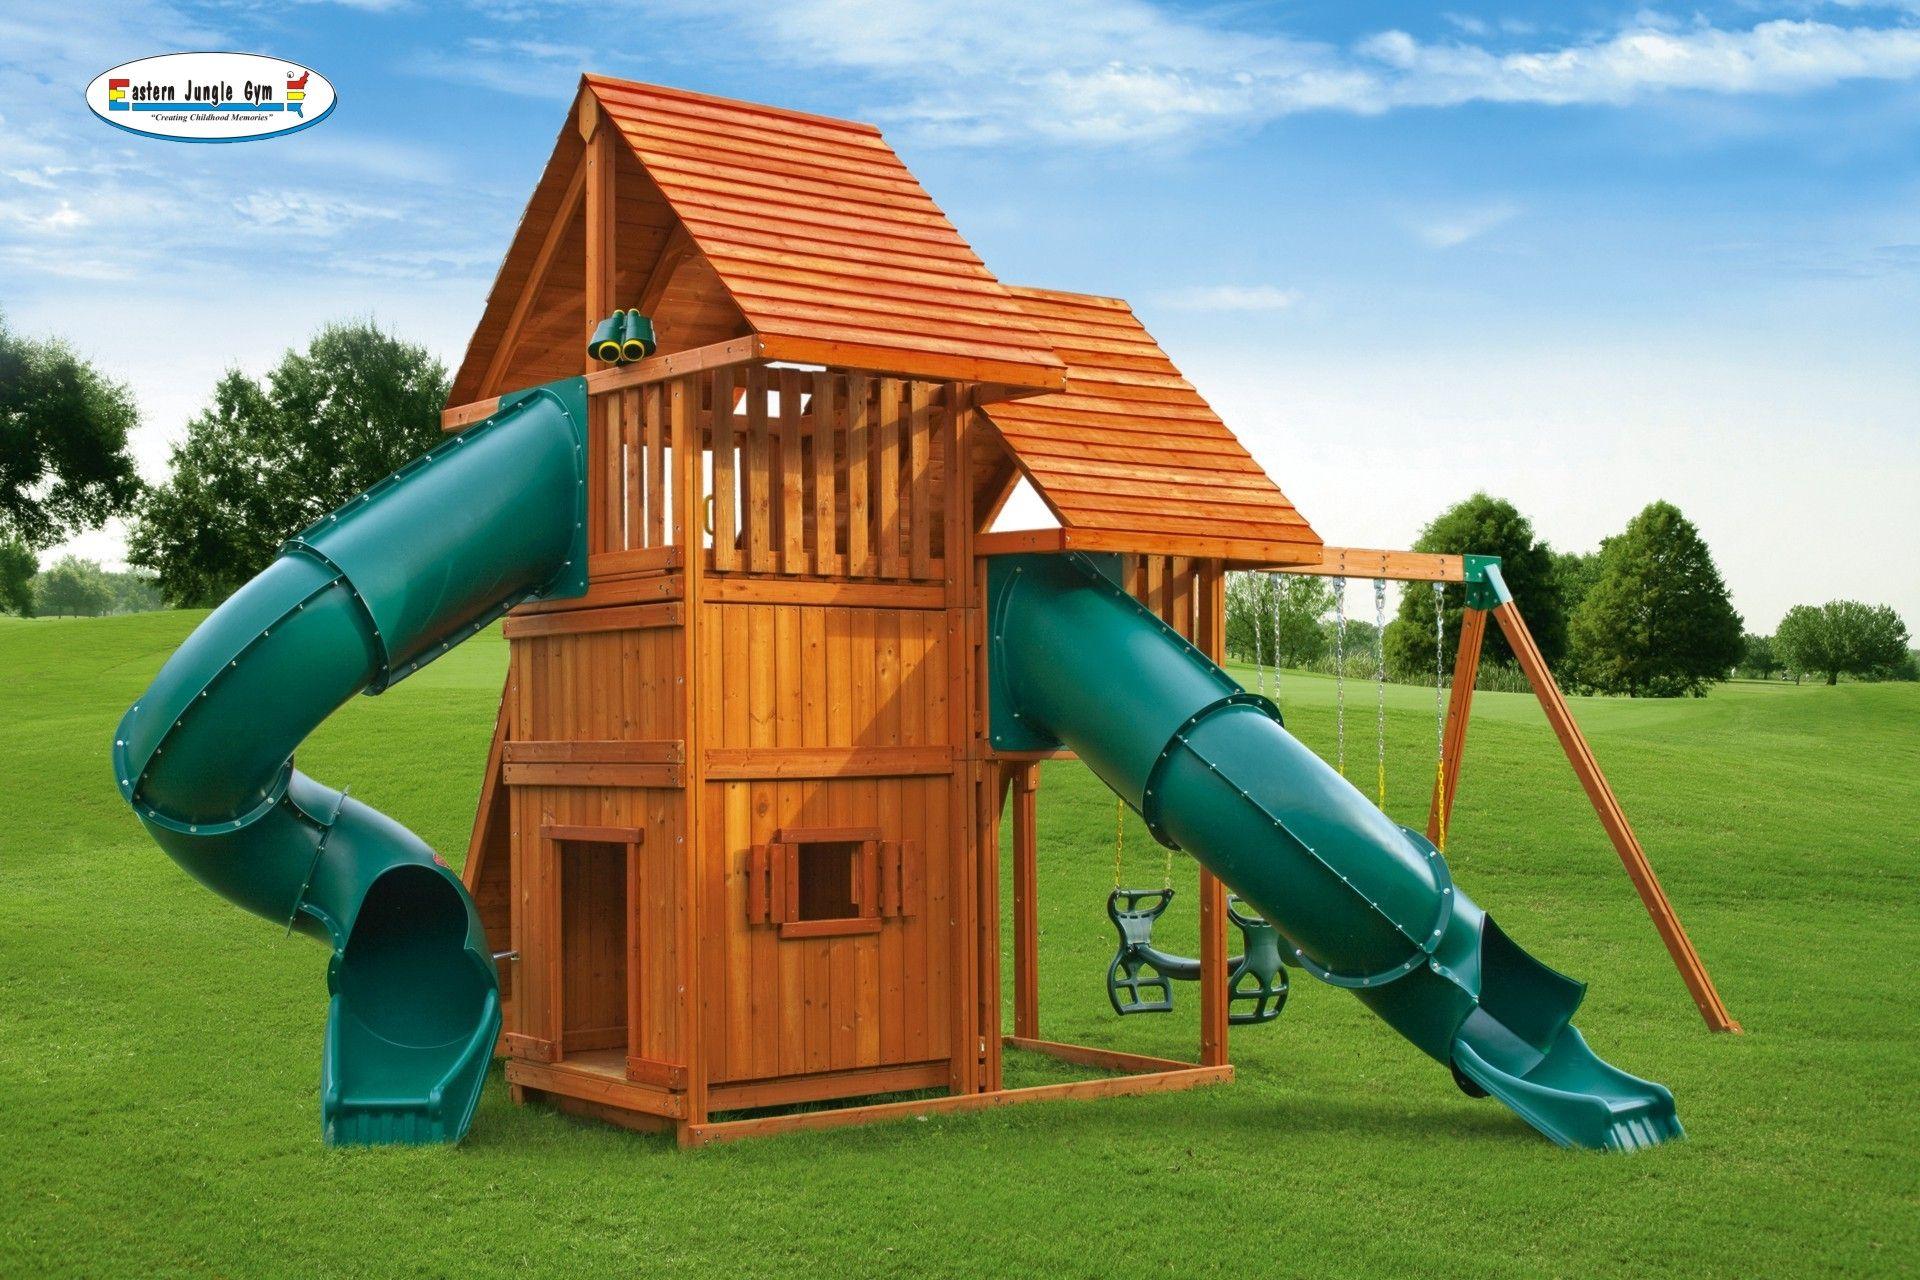 sky 6 backyard playground climbing wall swings and jungle gym